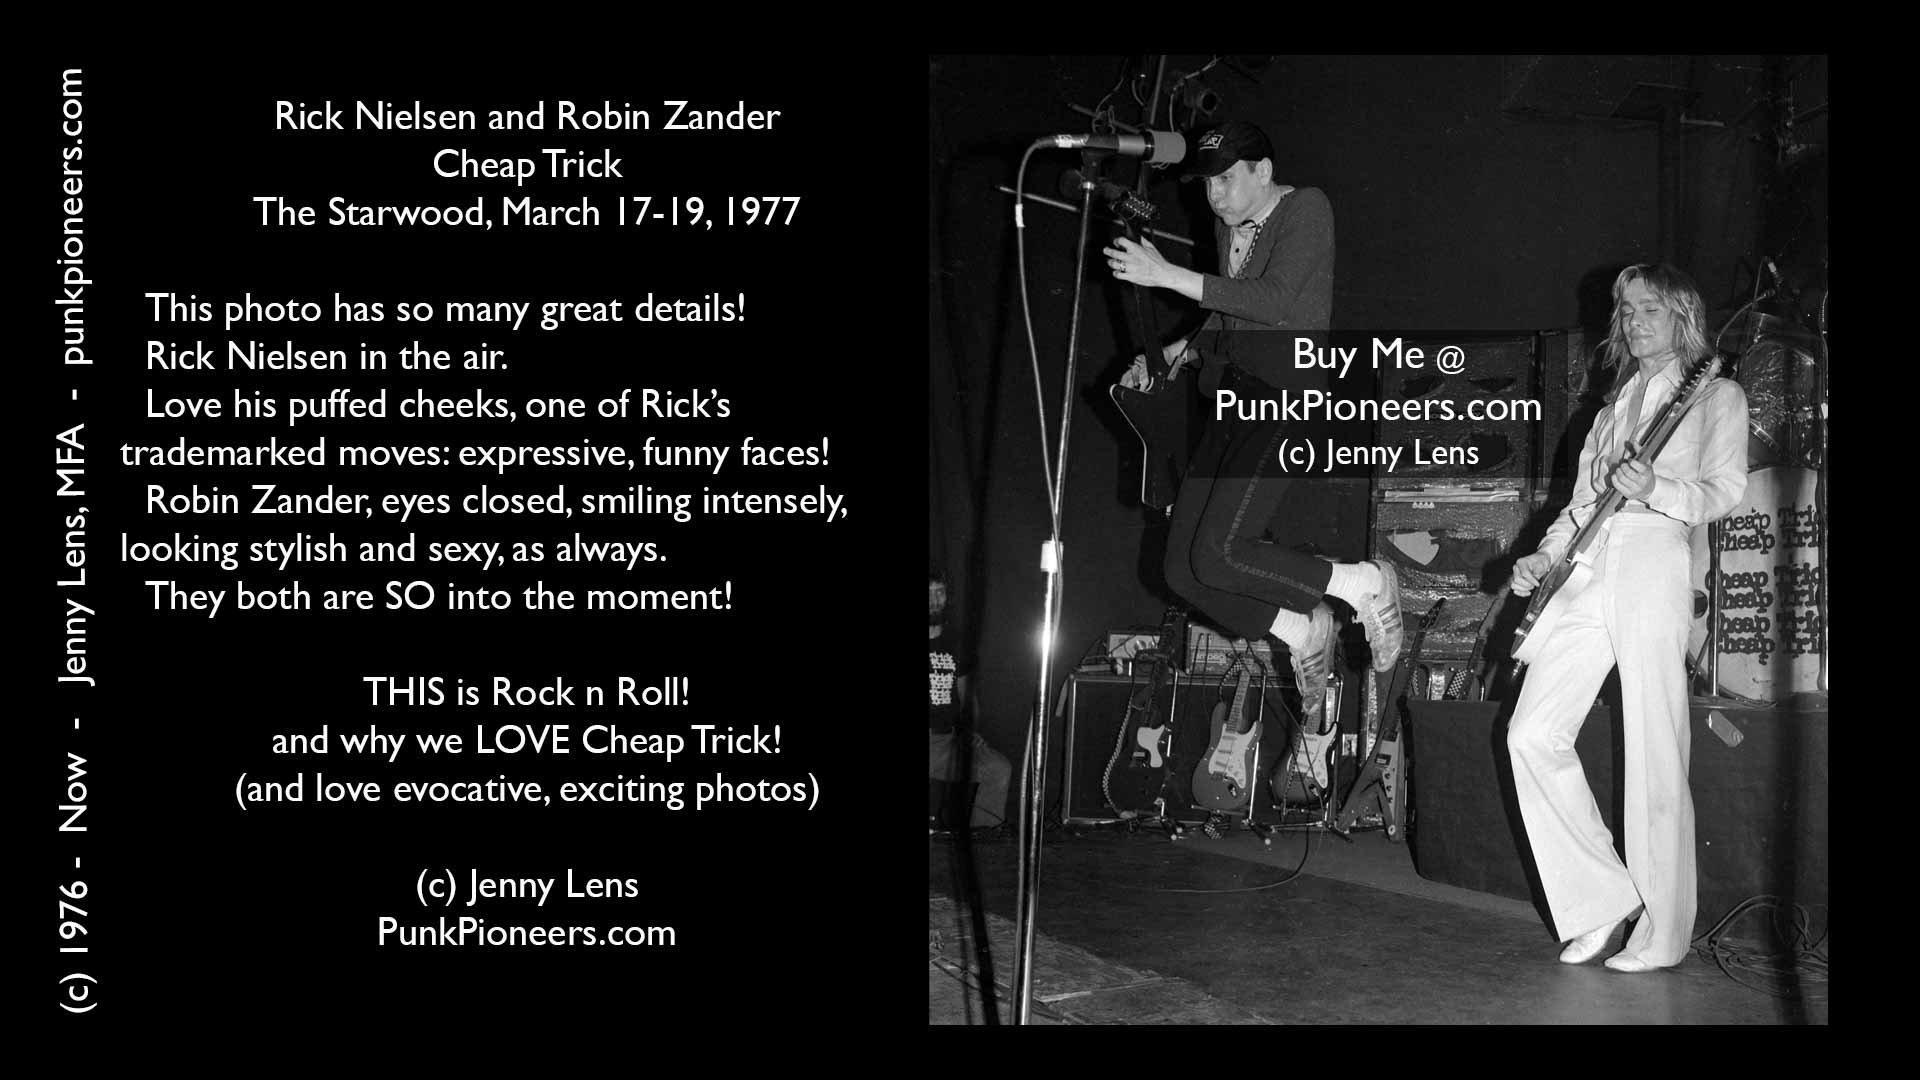 Cheap Trick, Rick Nielsen, Robin Zander, Starwood, March 1977, Jenny Lens, PunkPioneers.com